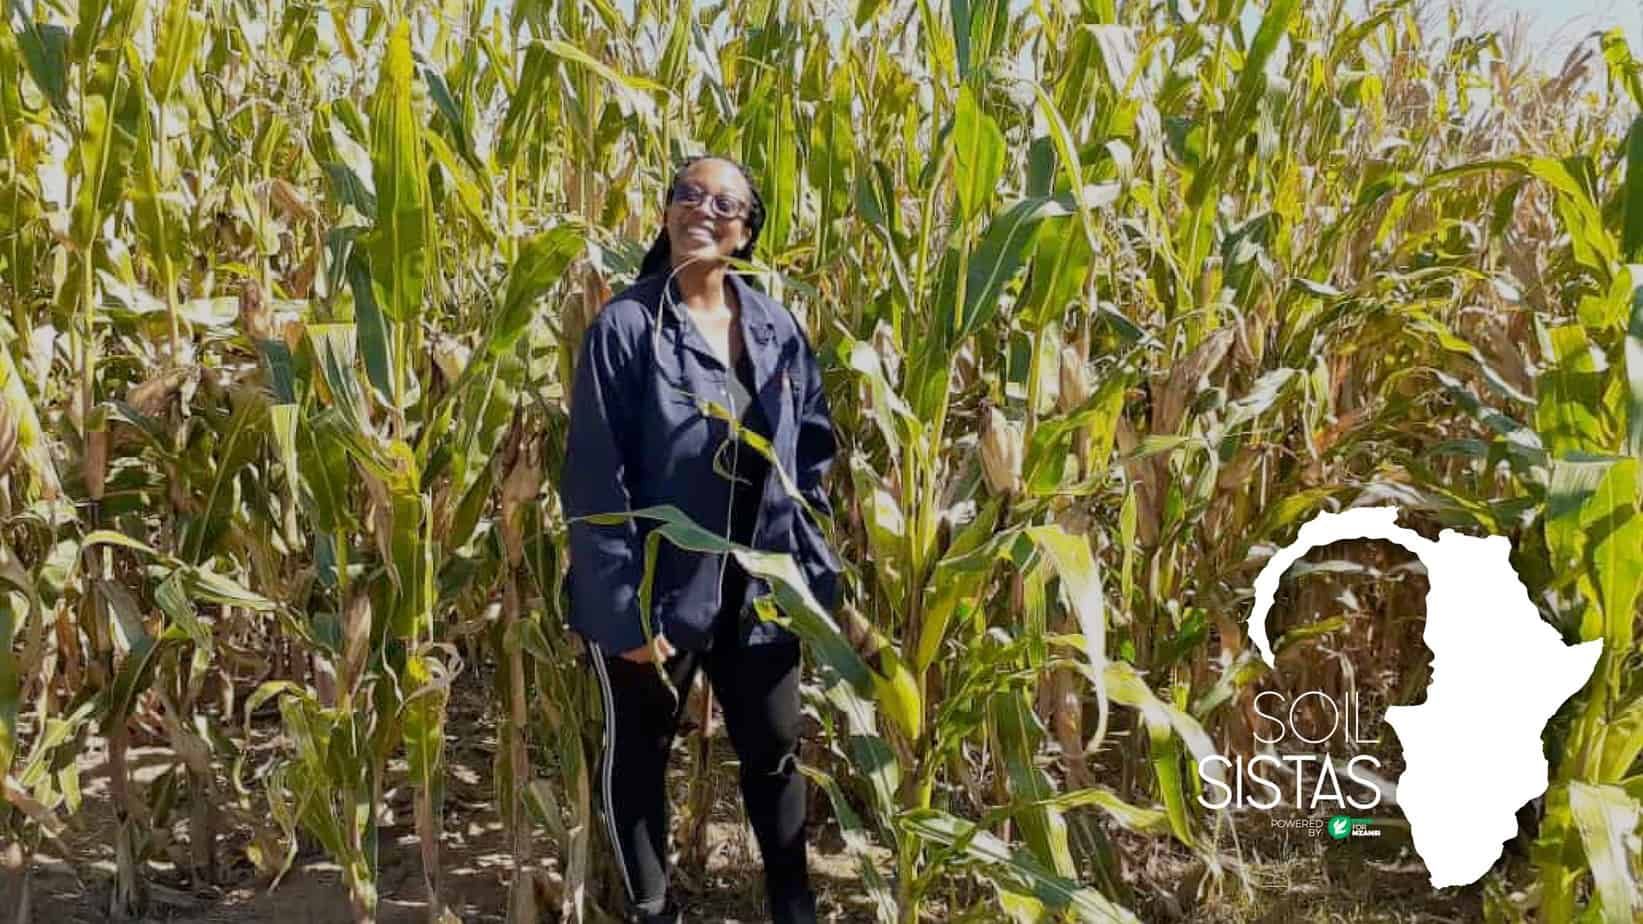 Keabetswe Mokgatla farms with maize and cattle in Kalbasfontein in Gauteng. Photo: Supplied/Food For Mzansi